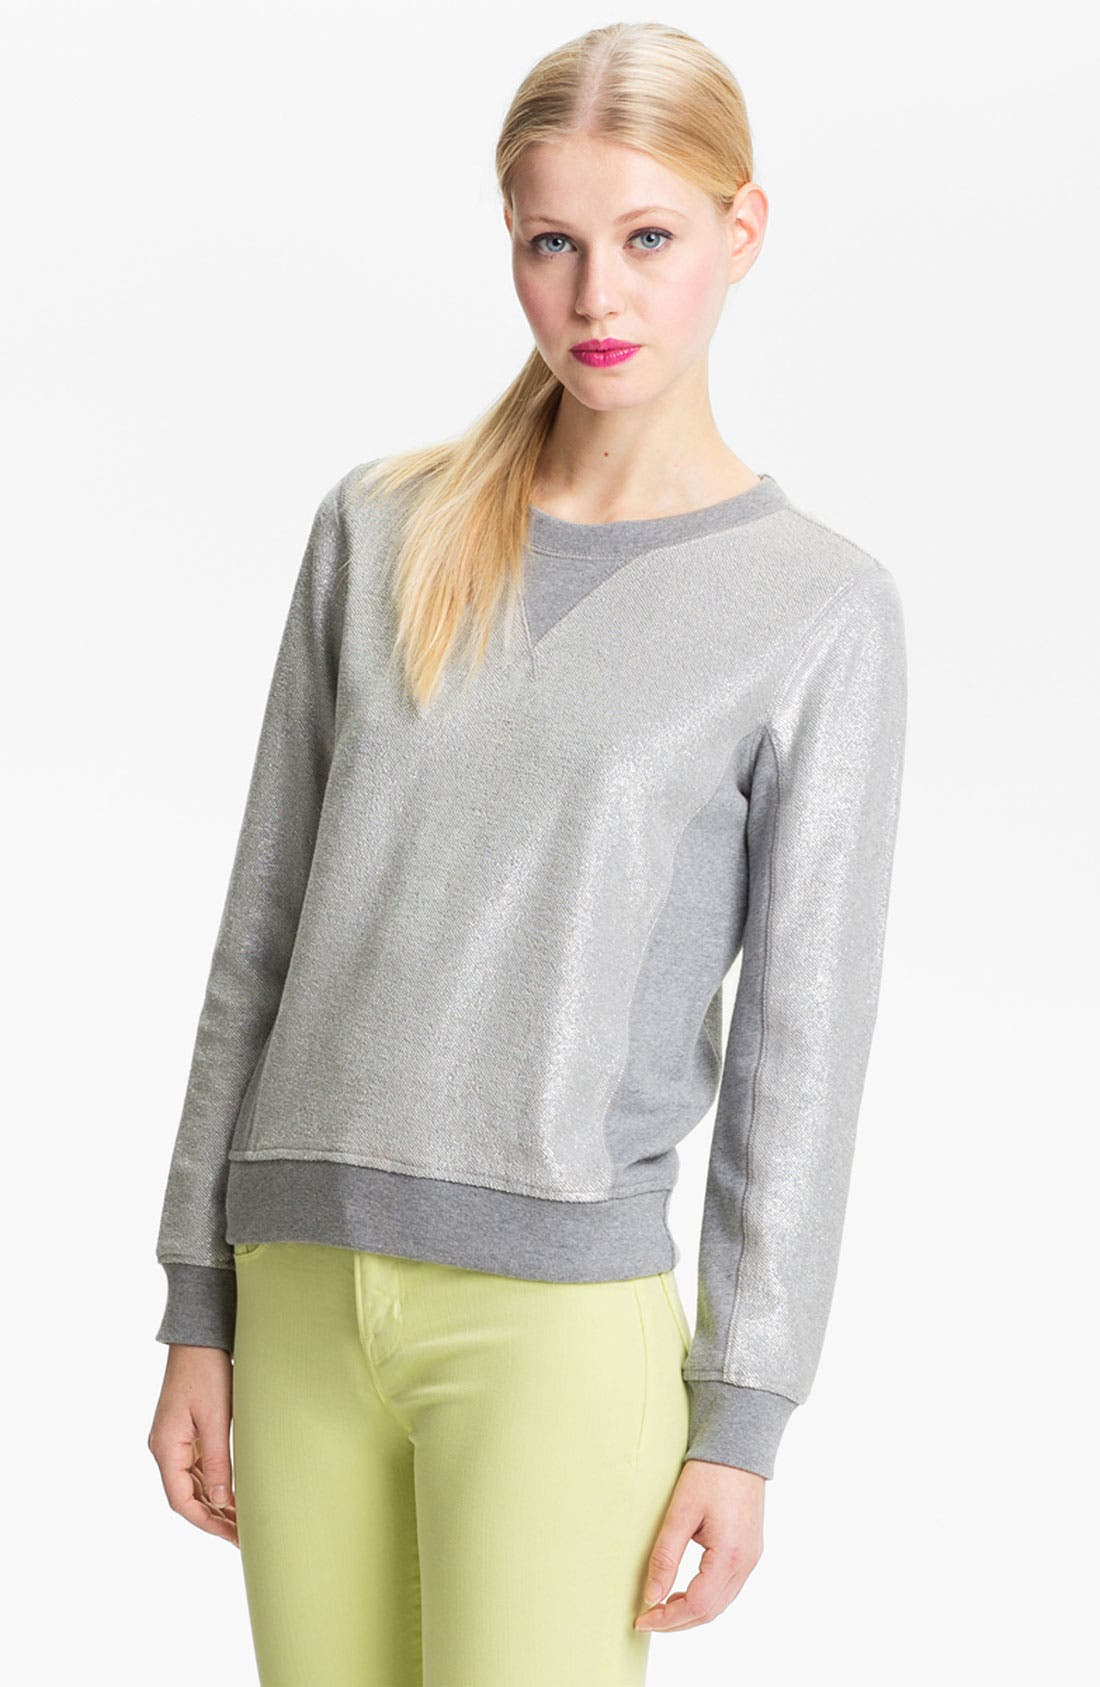 Alternate Image 1 Selected - MARC BY MARC JACOBS Metallic Coated Sweatshirt